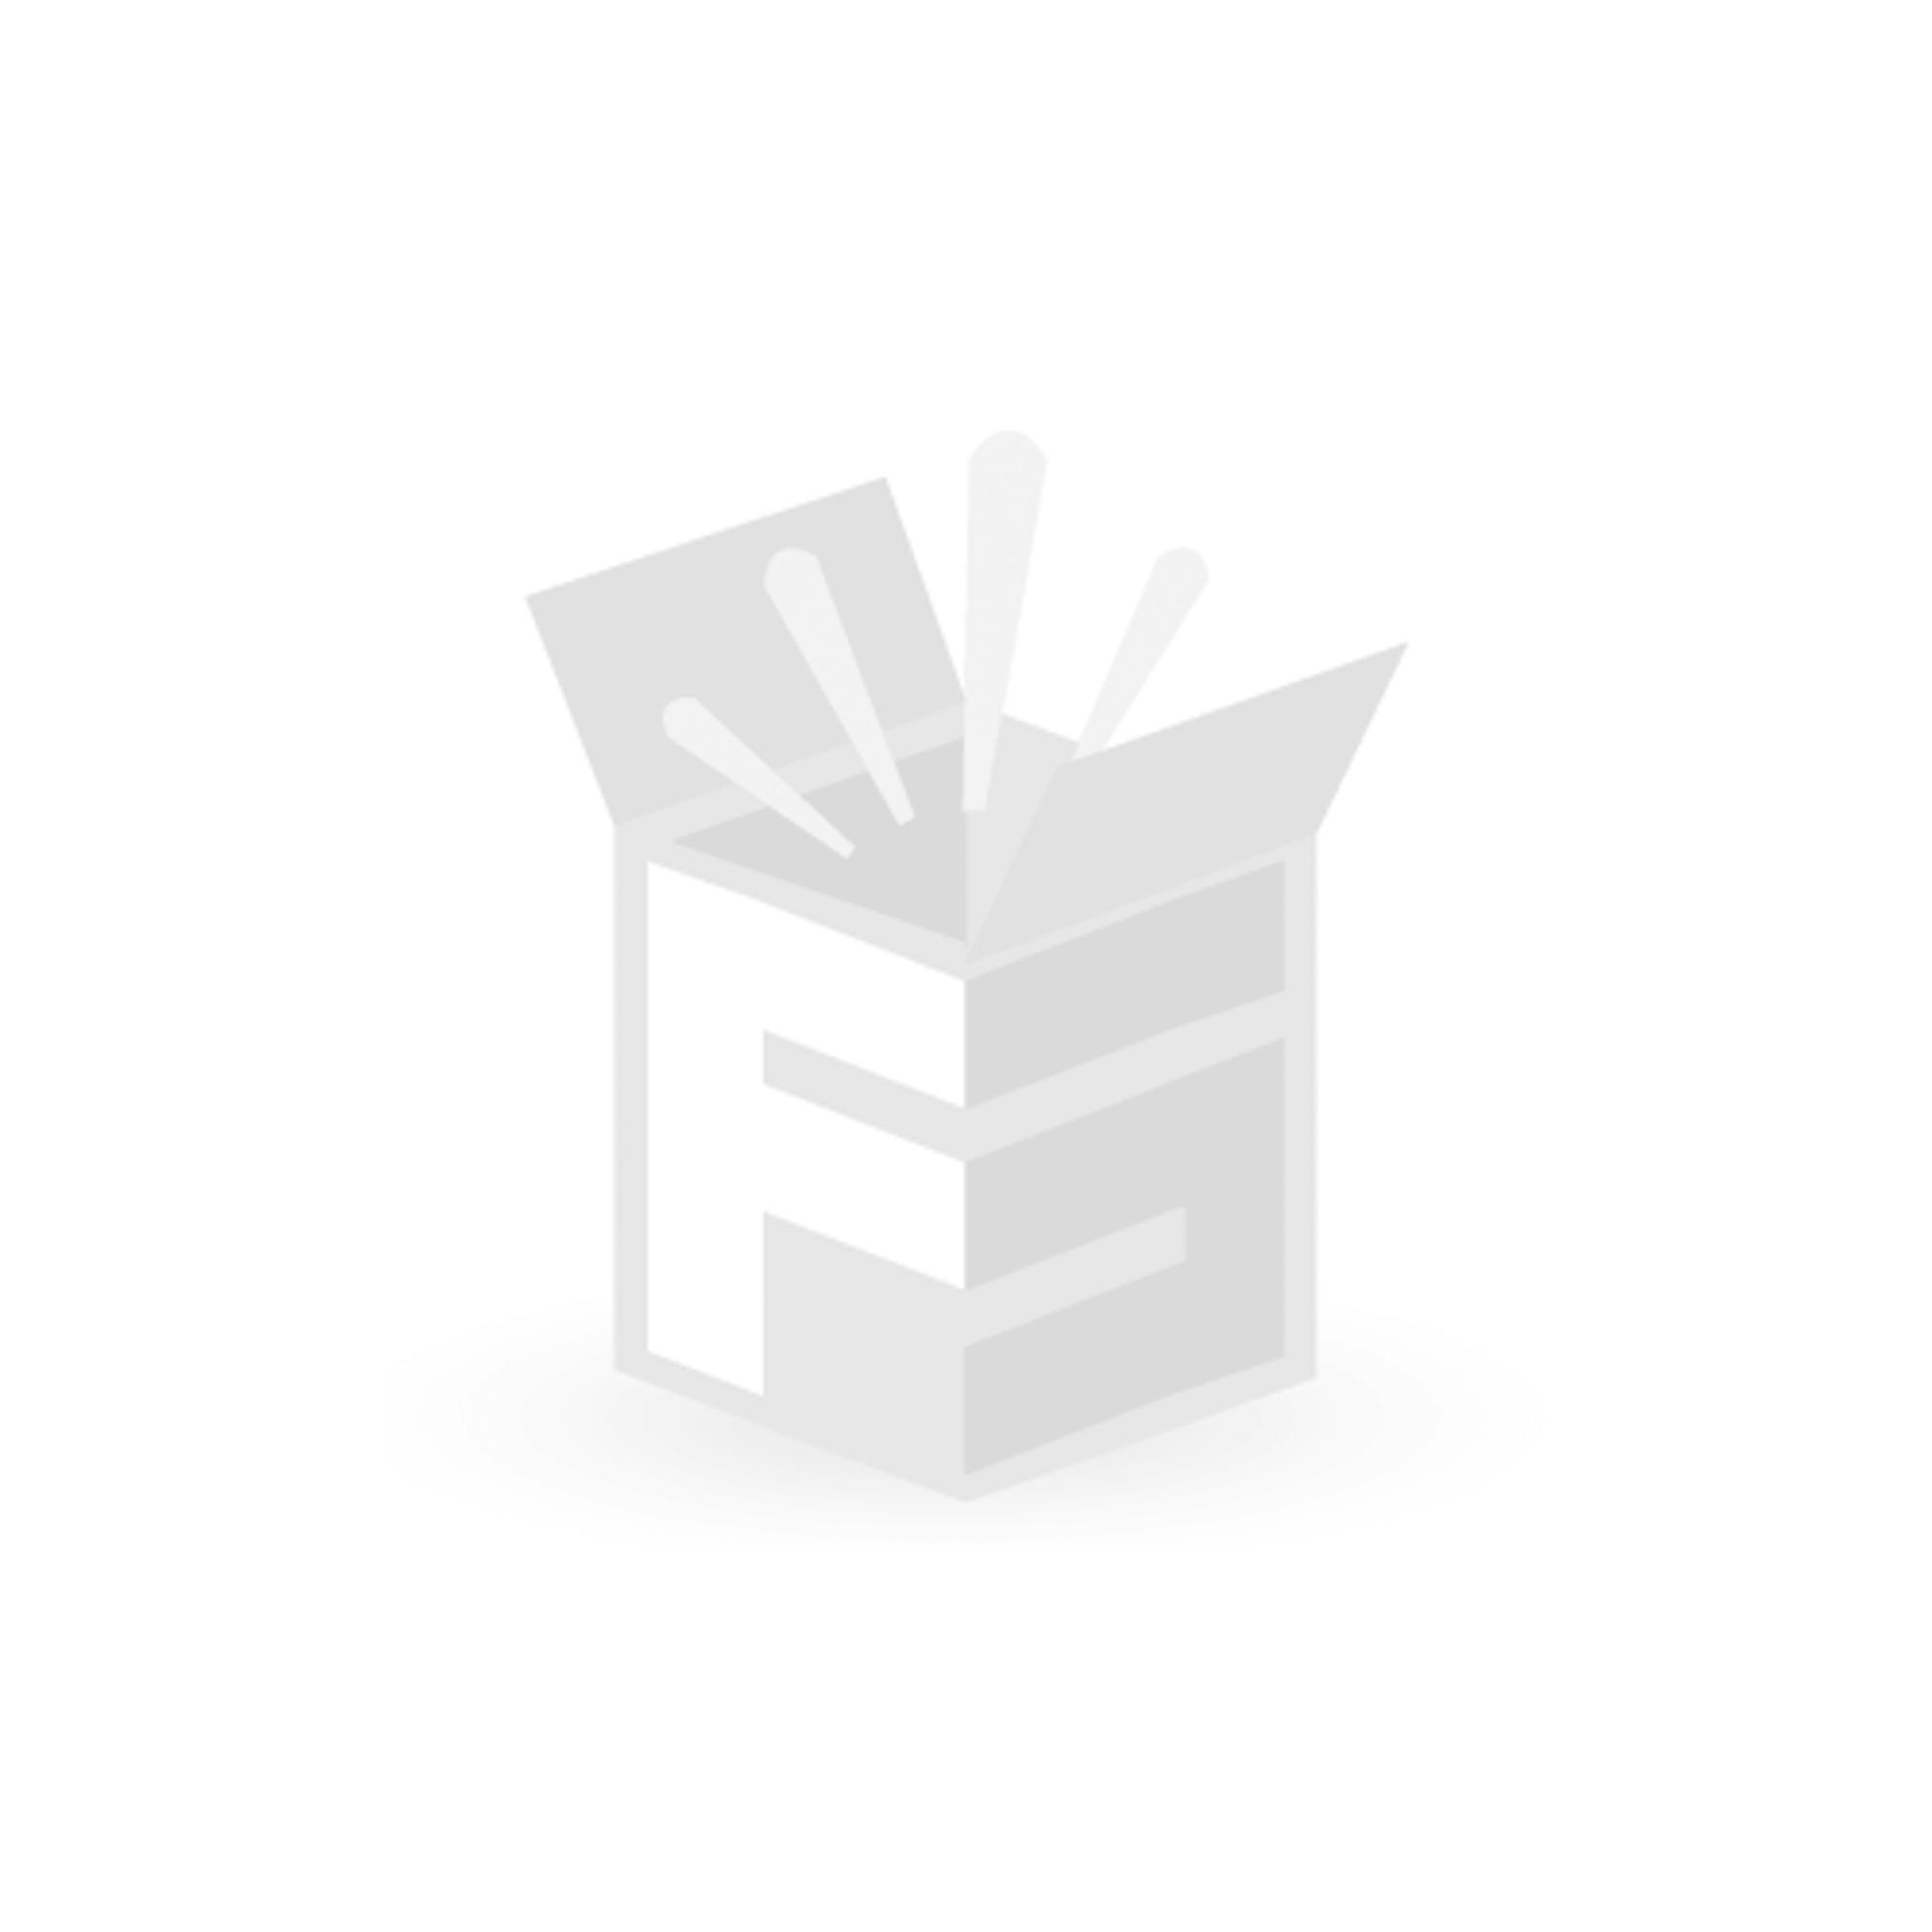 TAMARA-R Garniture Linge de lit Leano 160x210 + 65x100cm